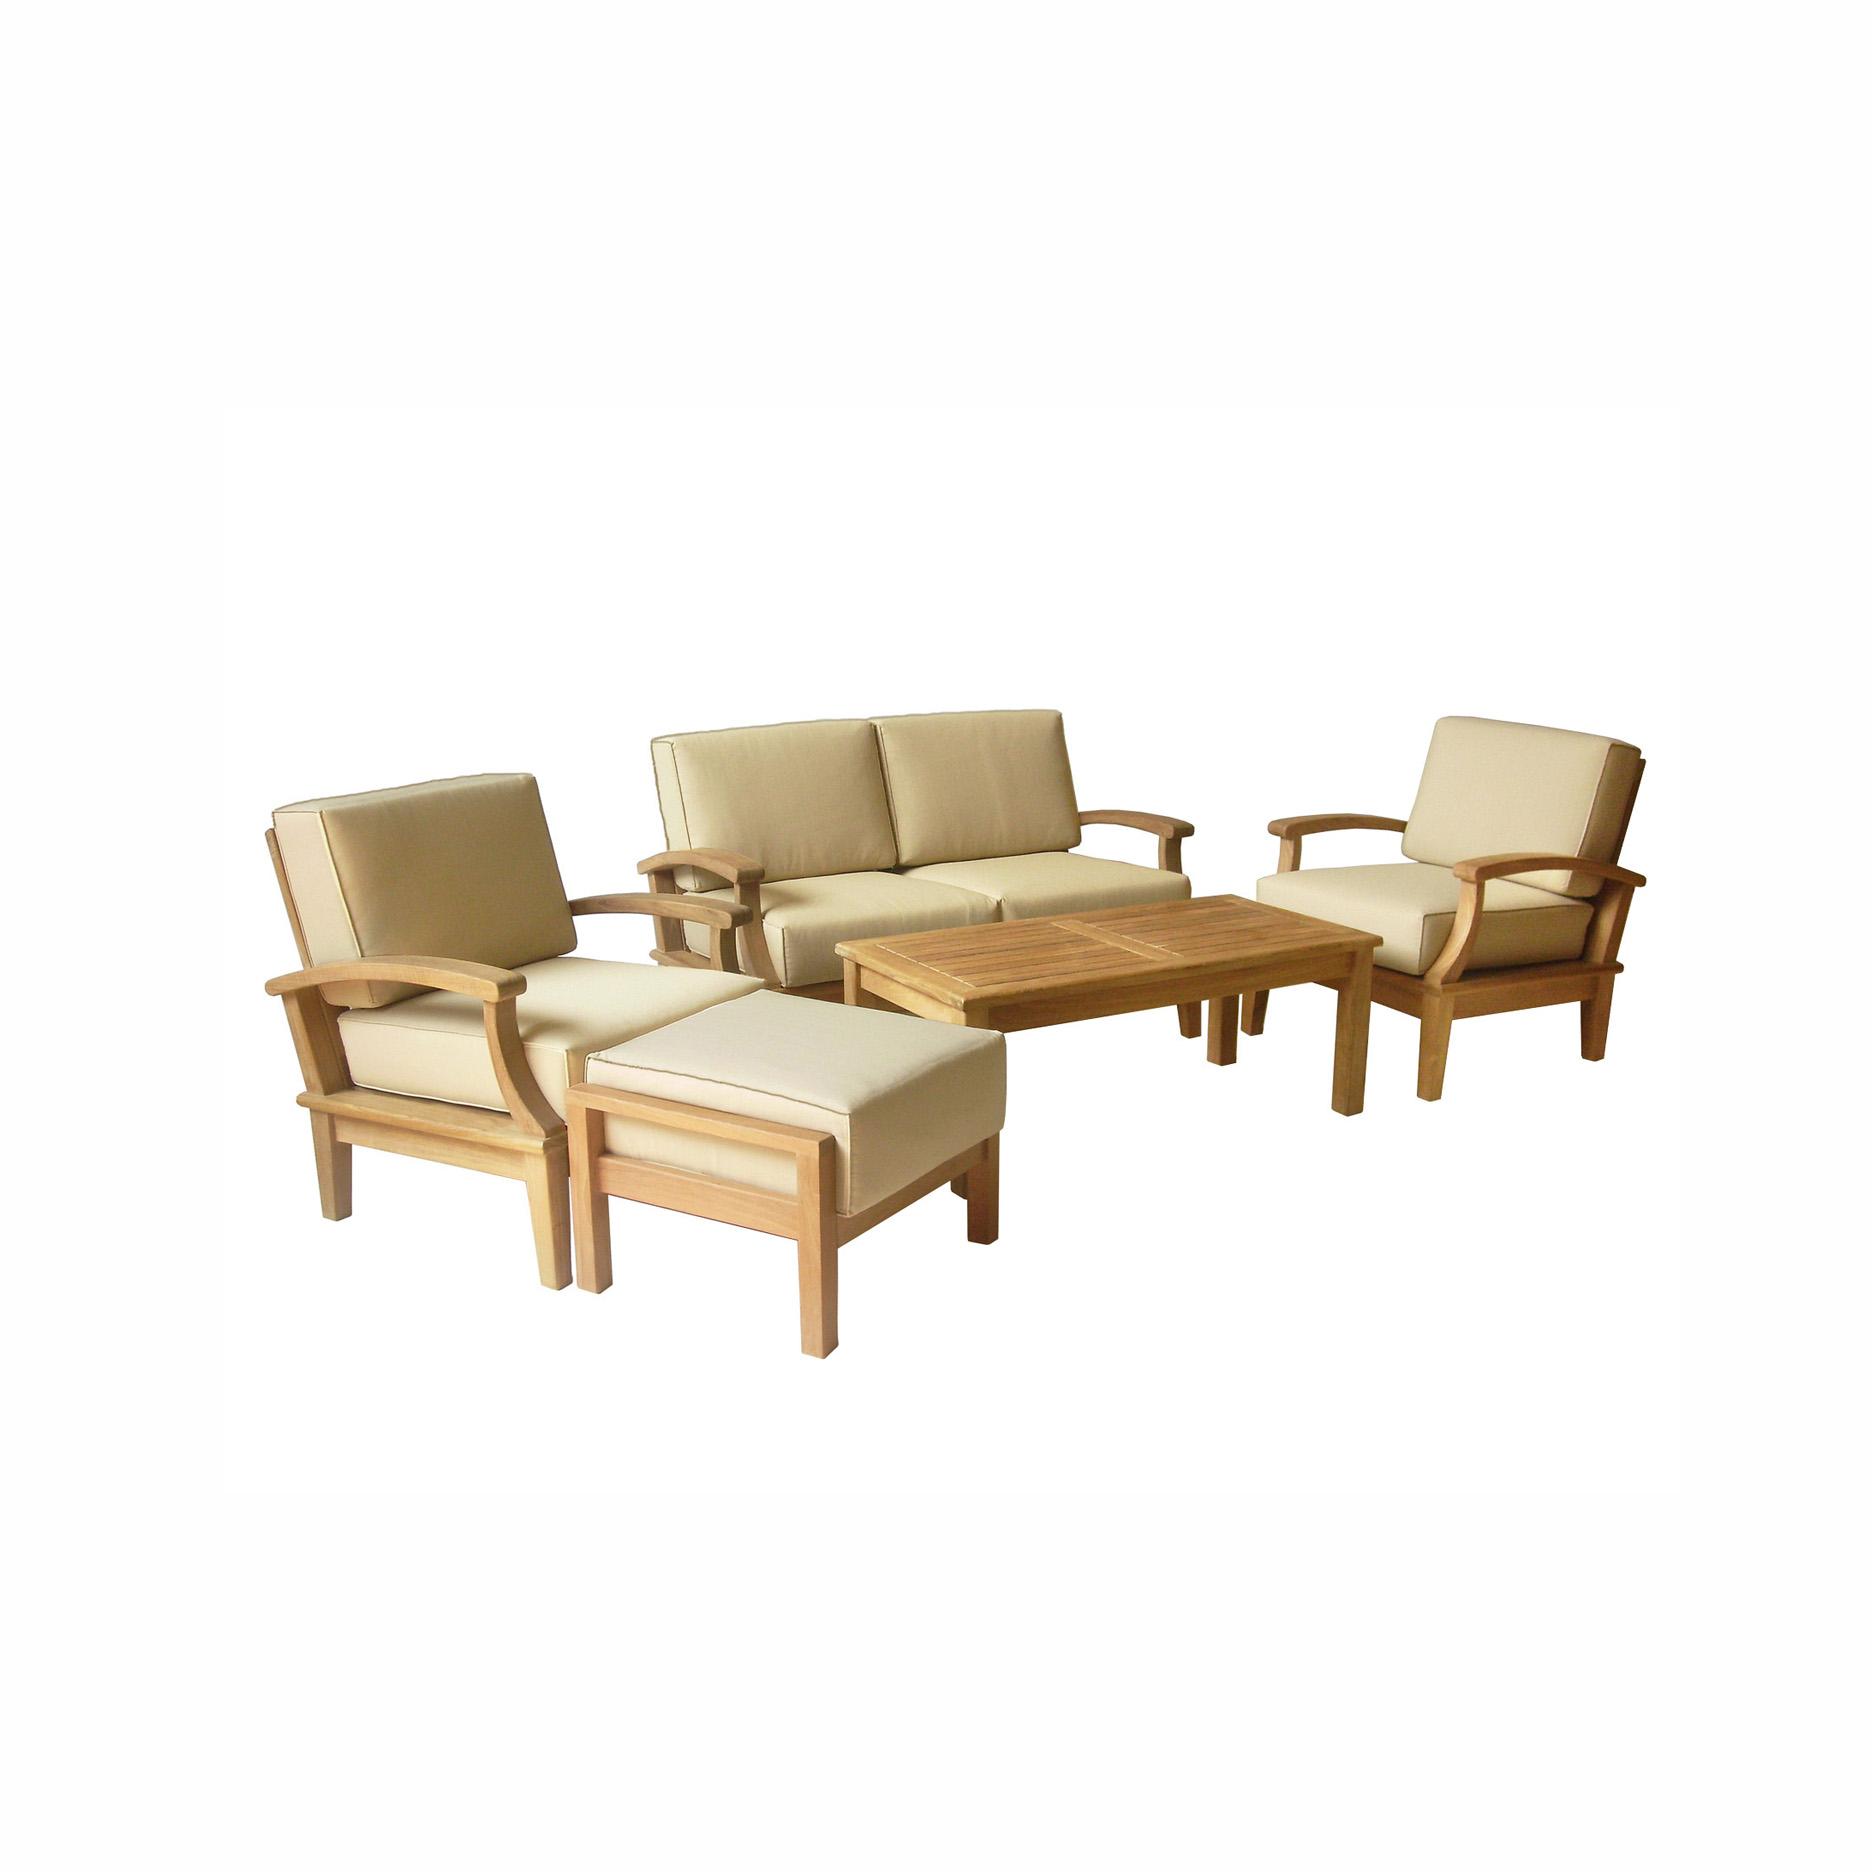 Teak Living and Lounge Magellan | Asia Concept | High quality teak ...